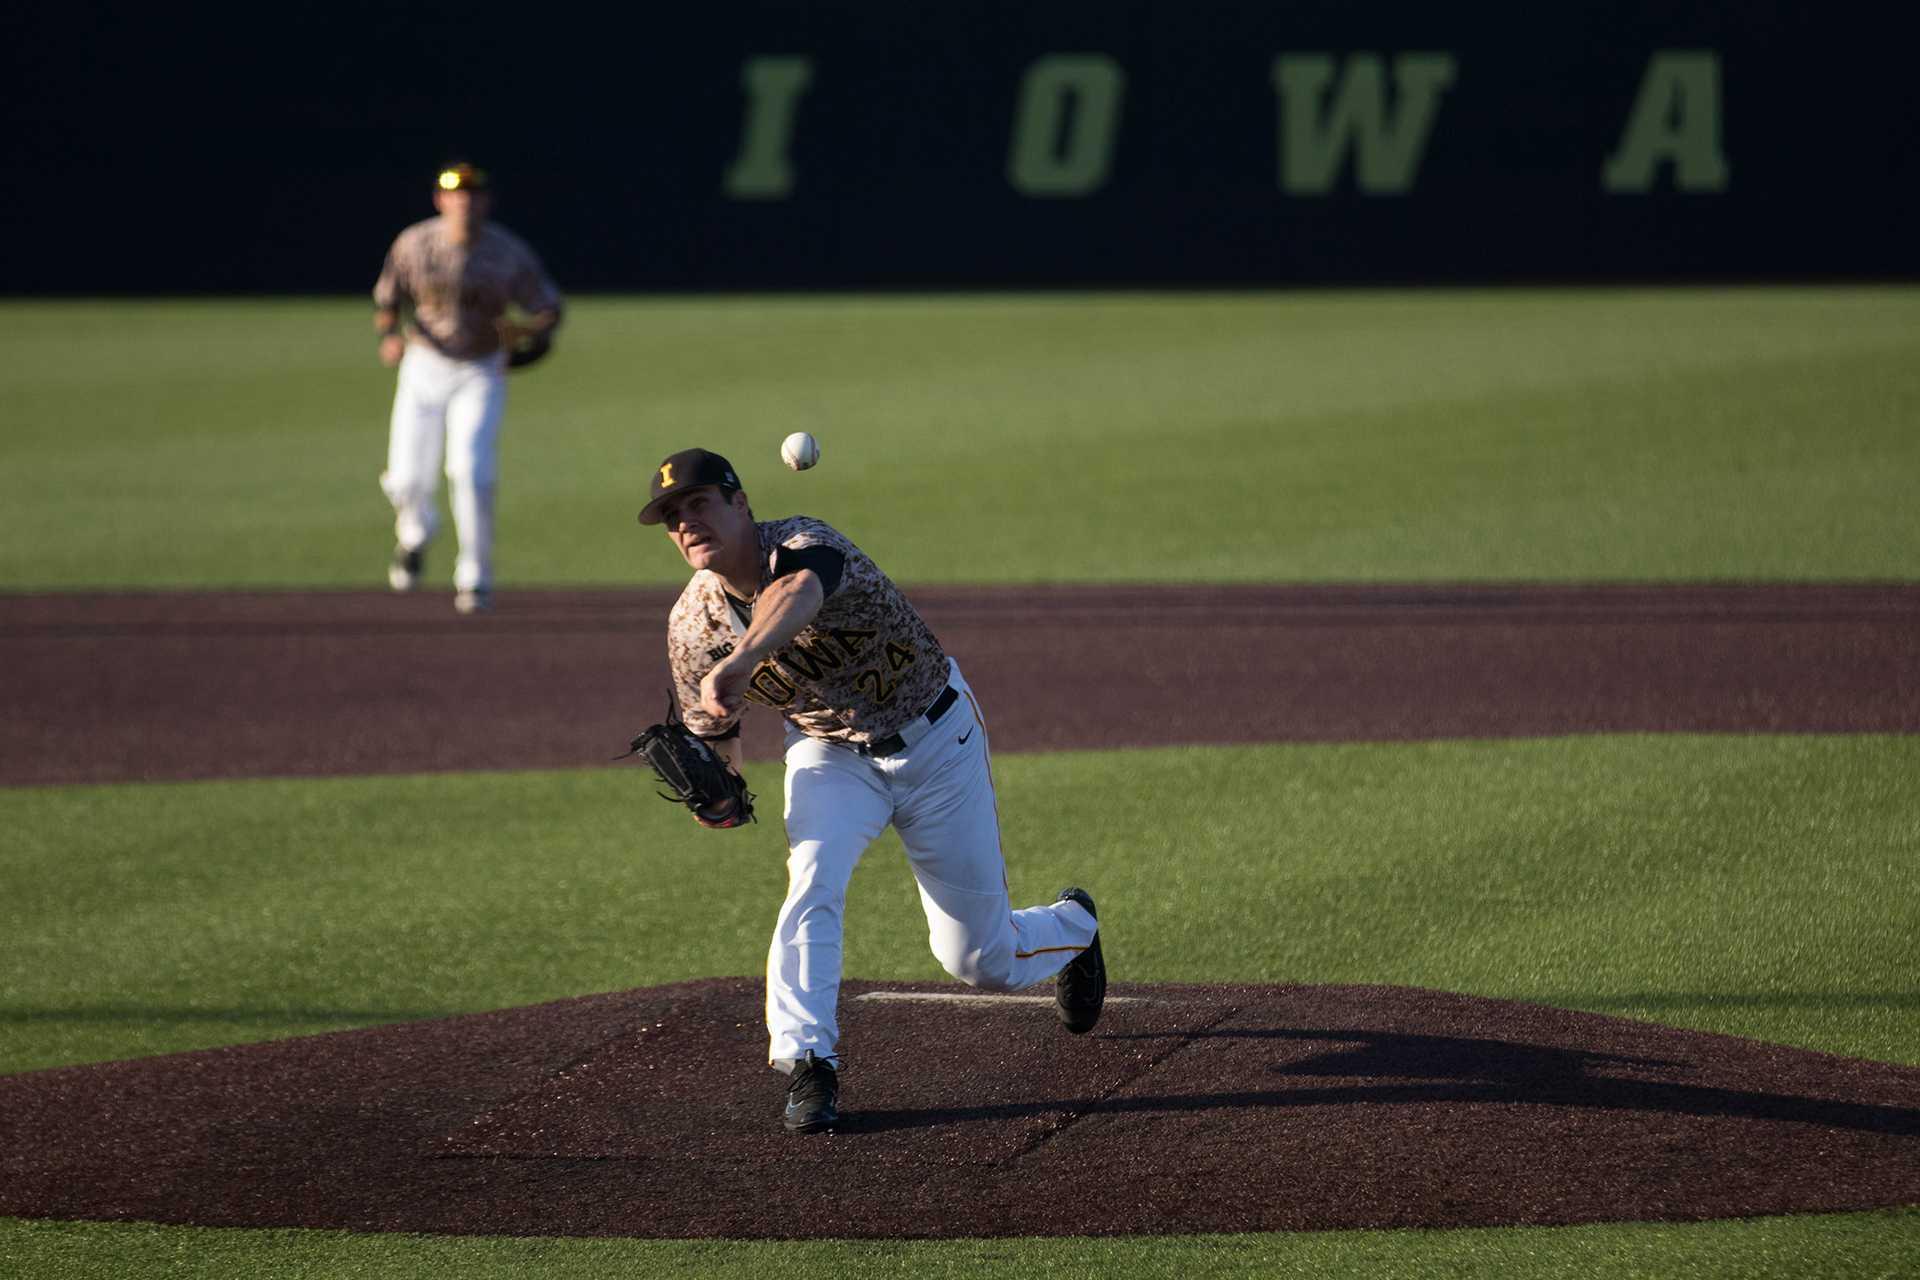 Photos: Iowa baseball vs. Oklahoma State (05/04/18)